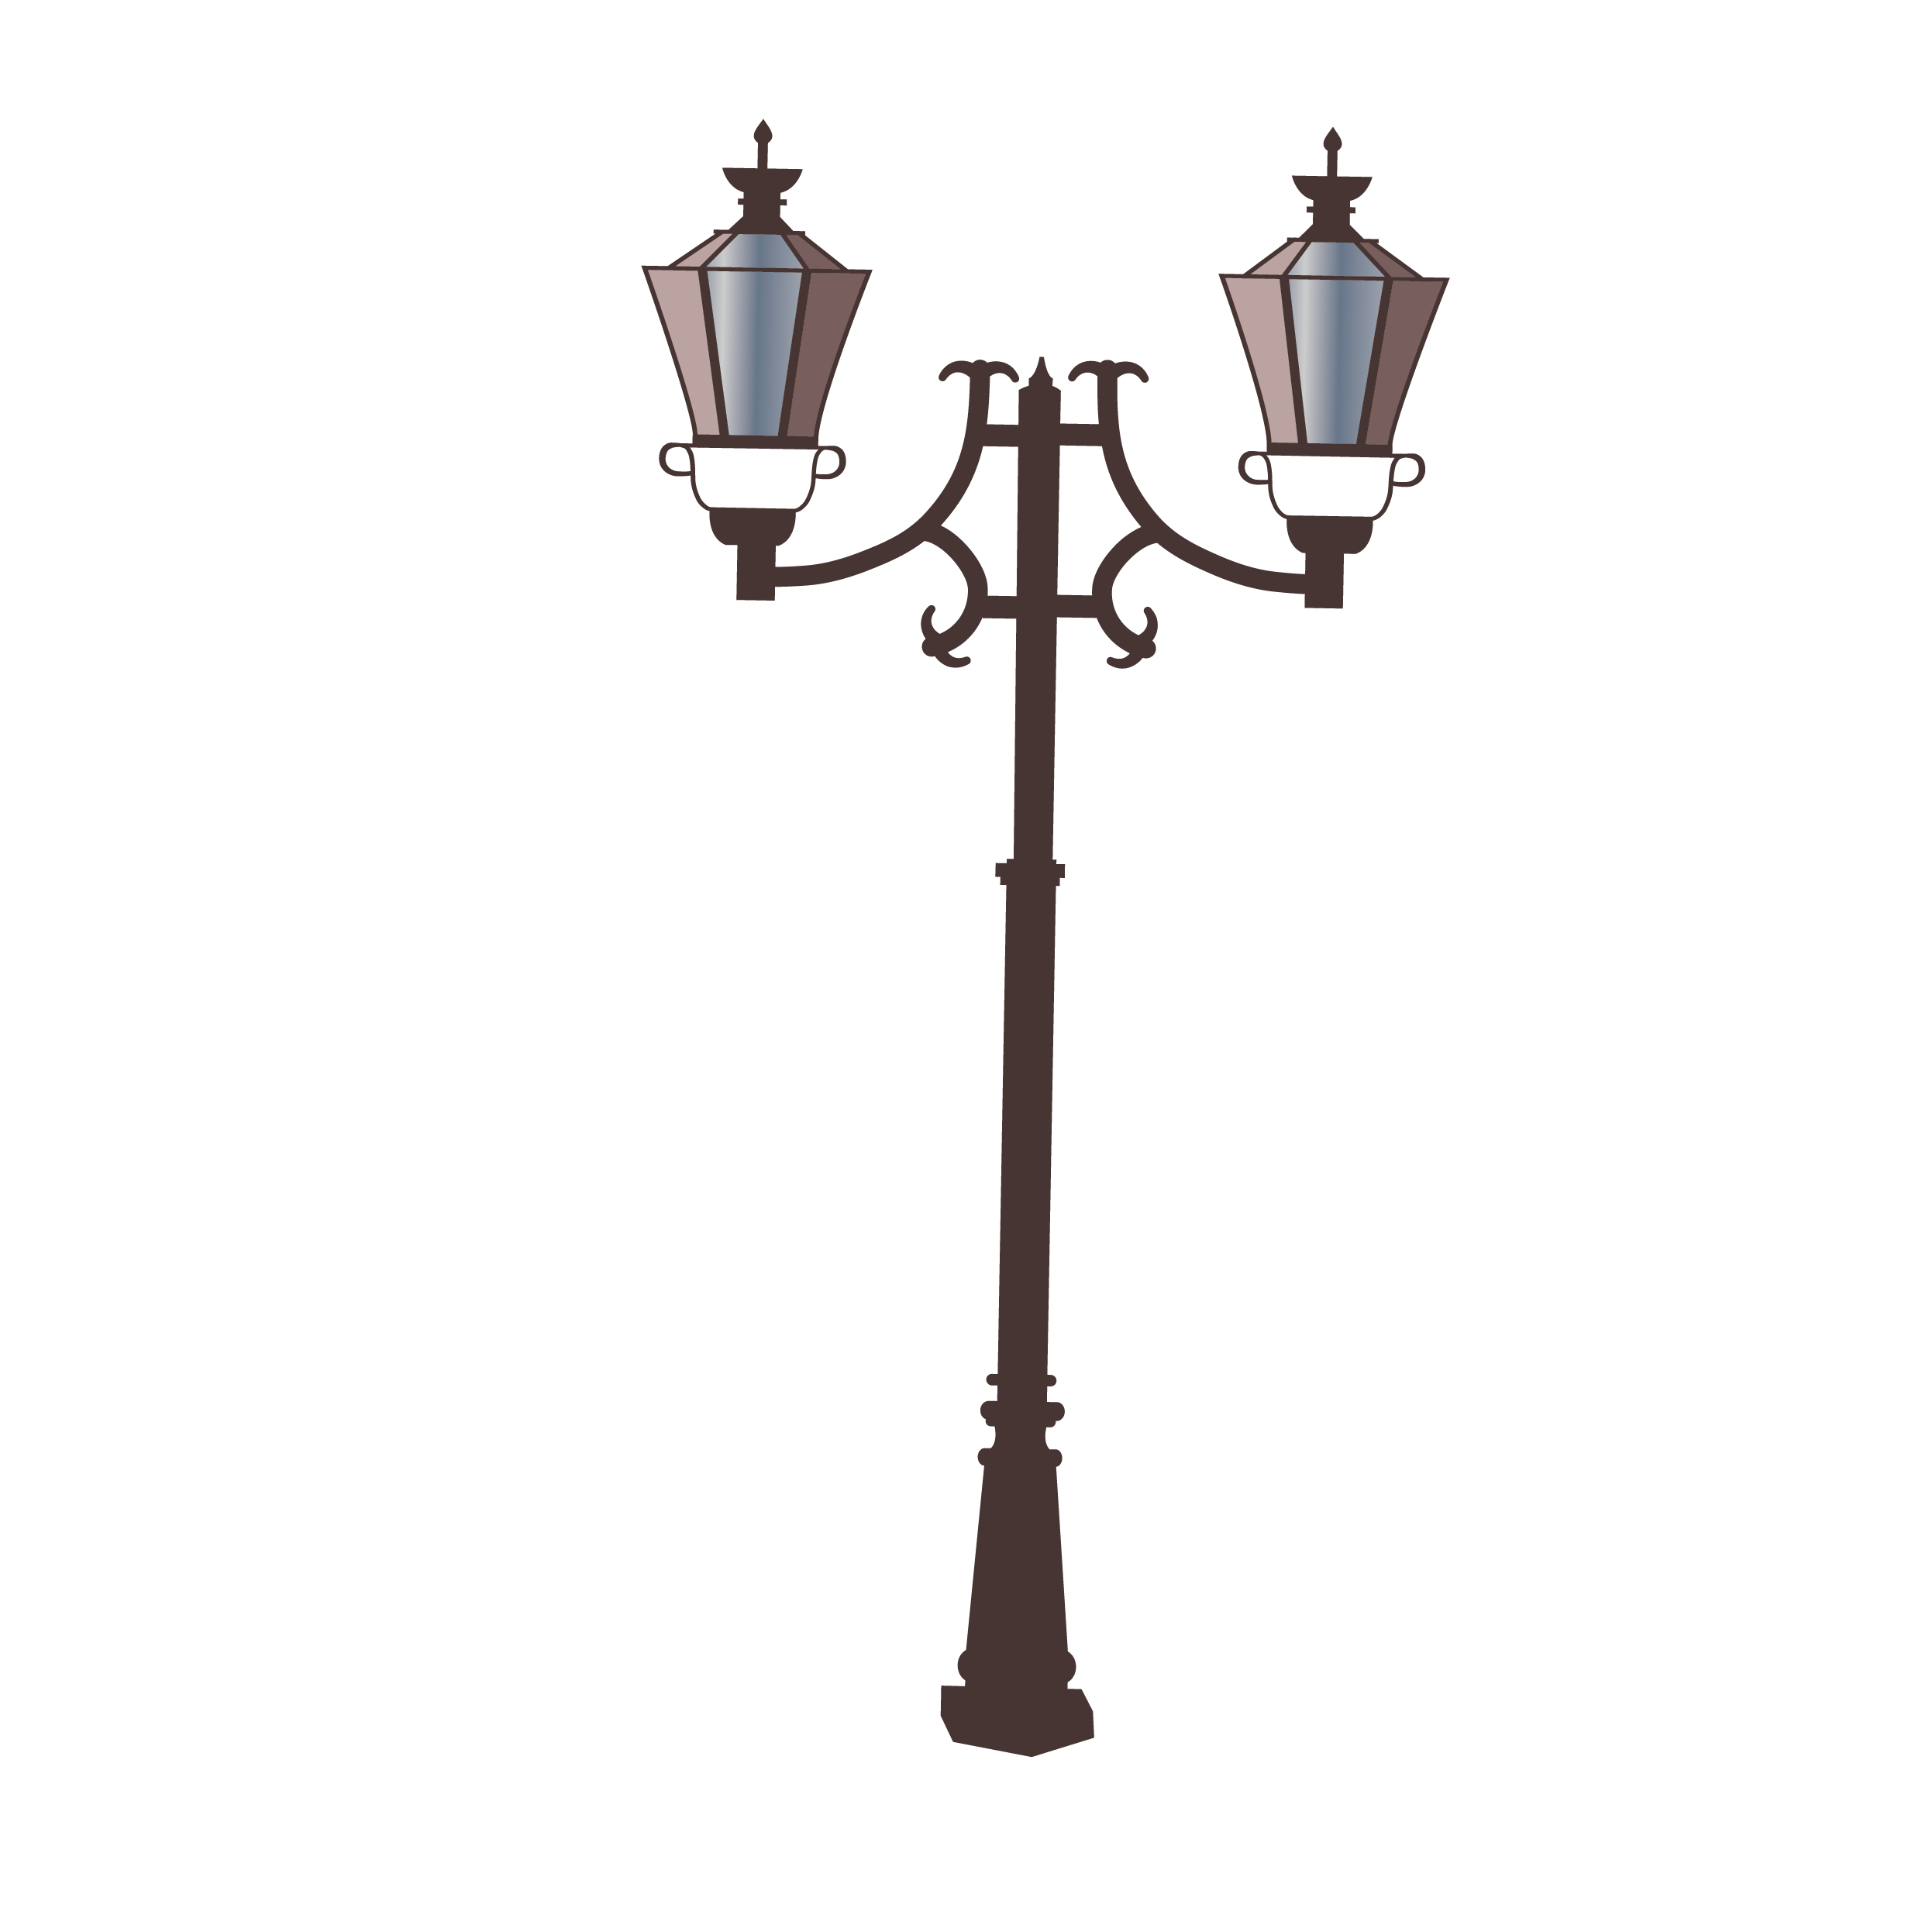 2480x2493 Street Light Lamp